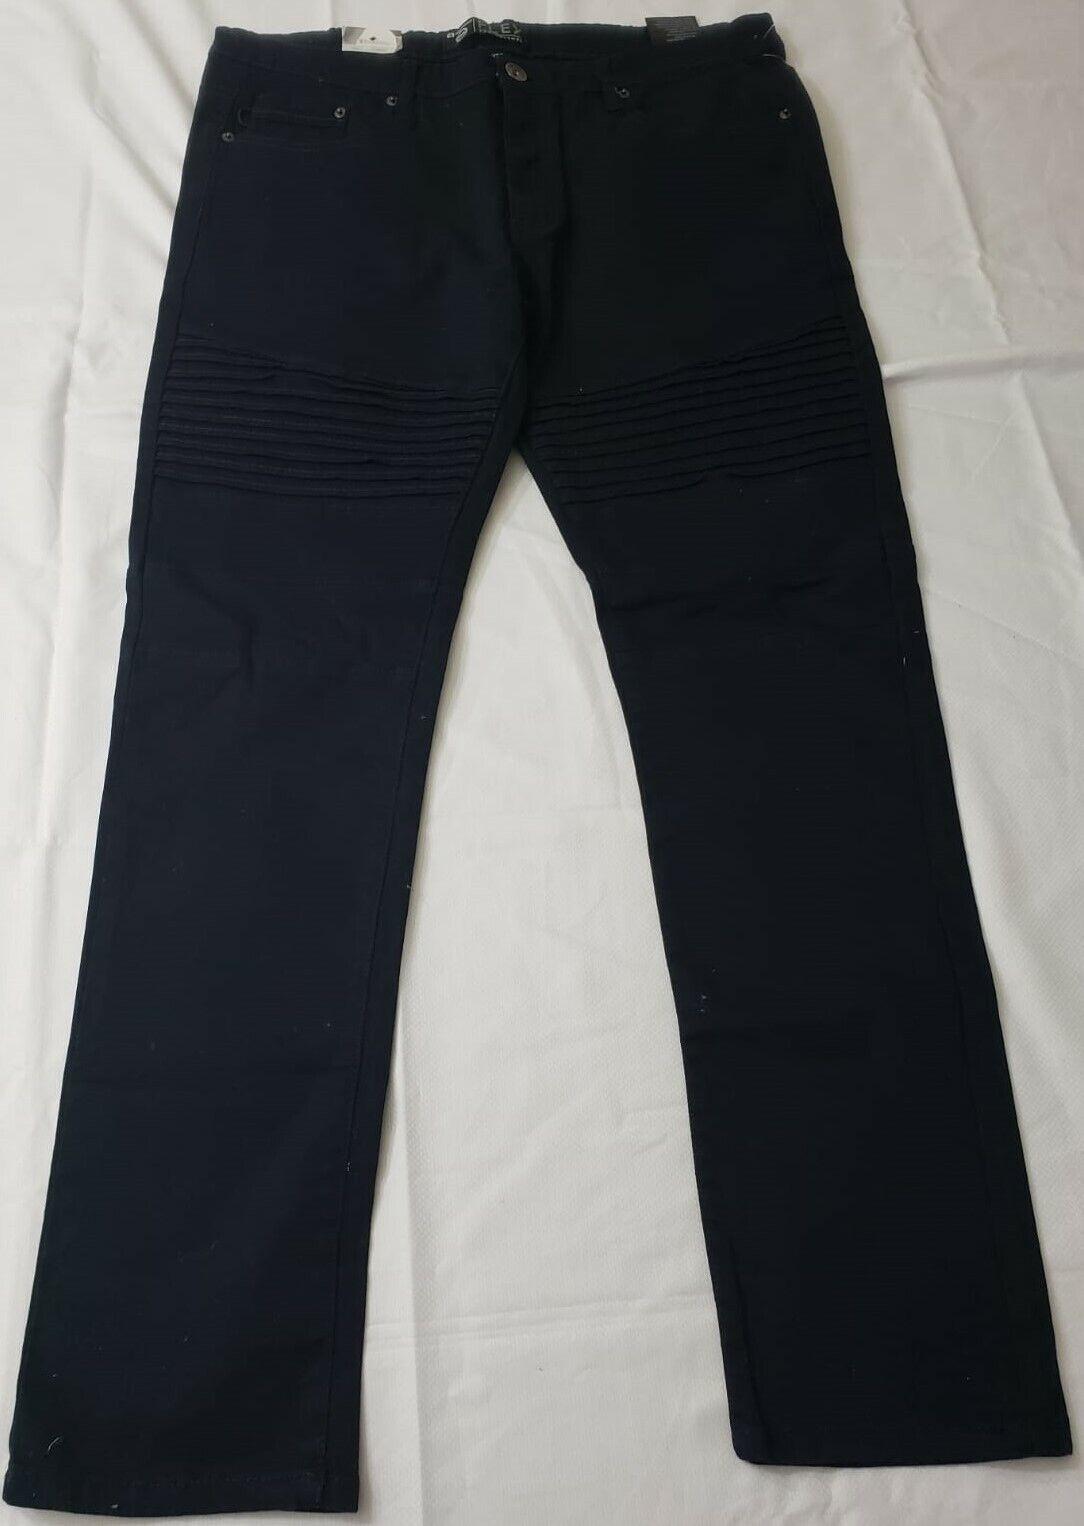 Southpole Men's Flex Stretch Basic Twill and Rinse Denim Pants Size 38 x 32